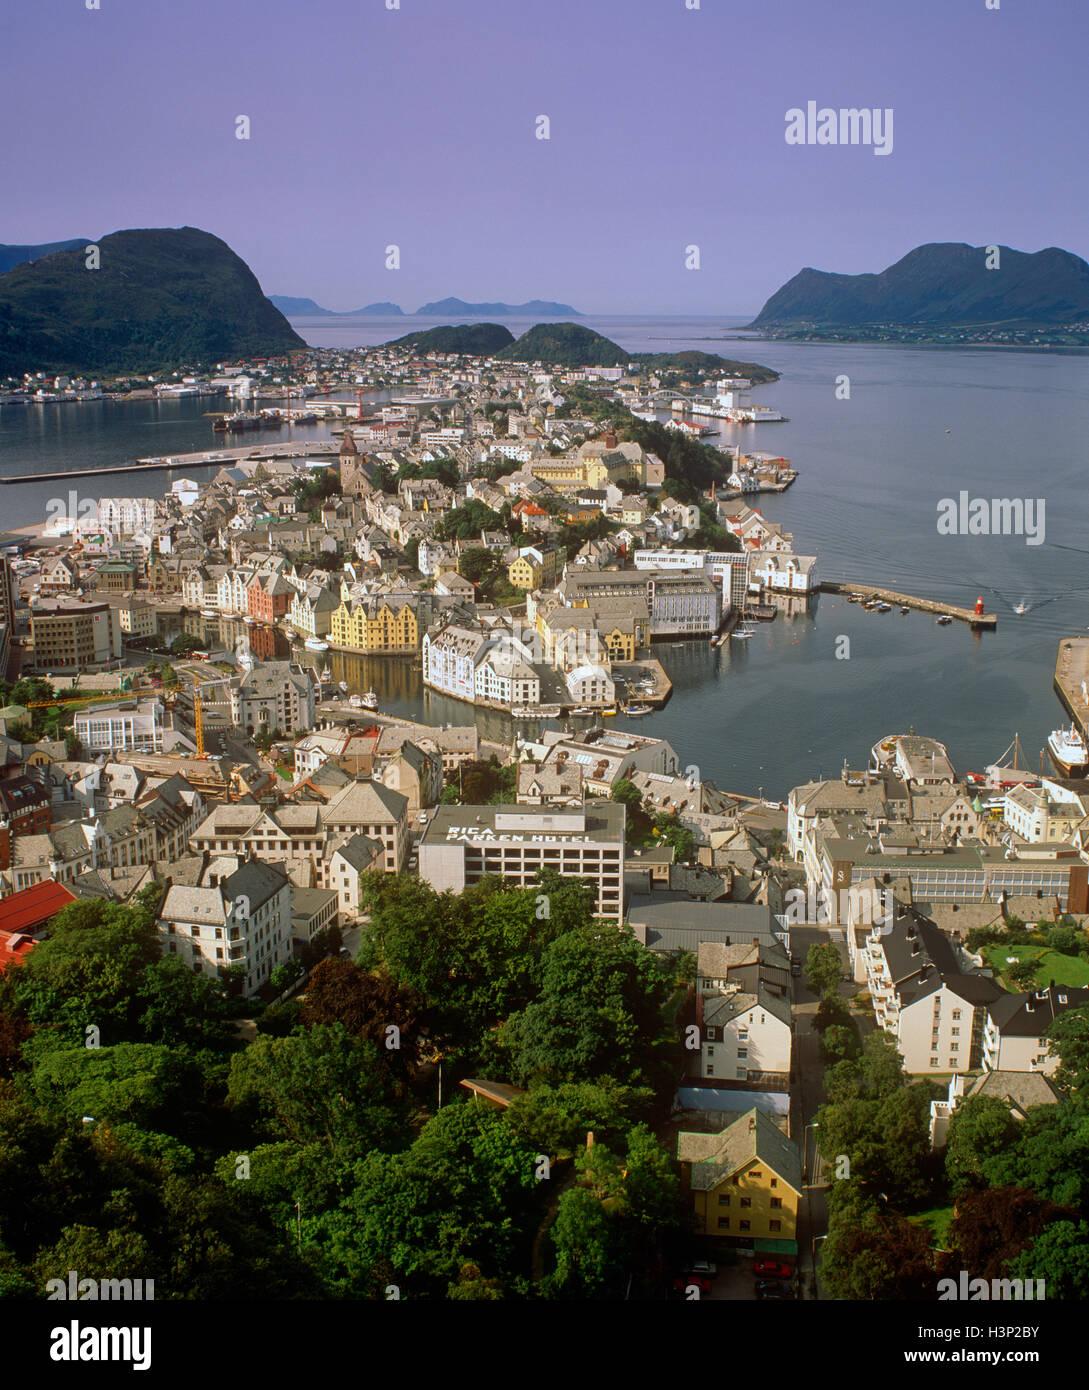 Aalesund, More og Romsdal, Norway - Stock Image